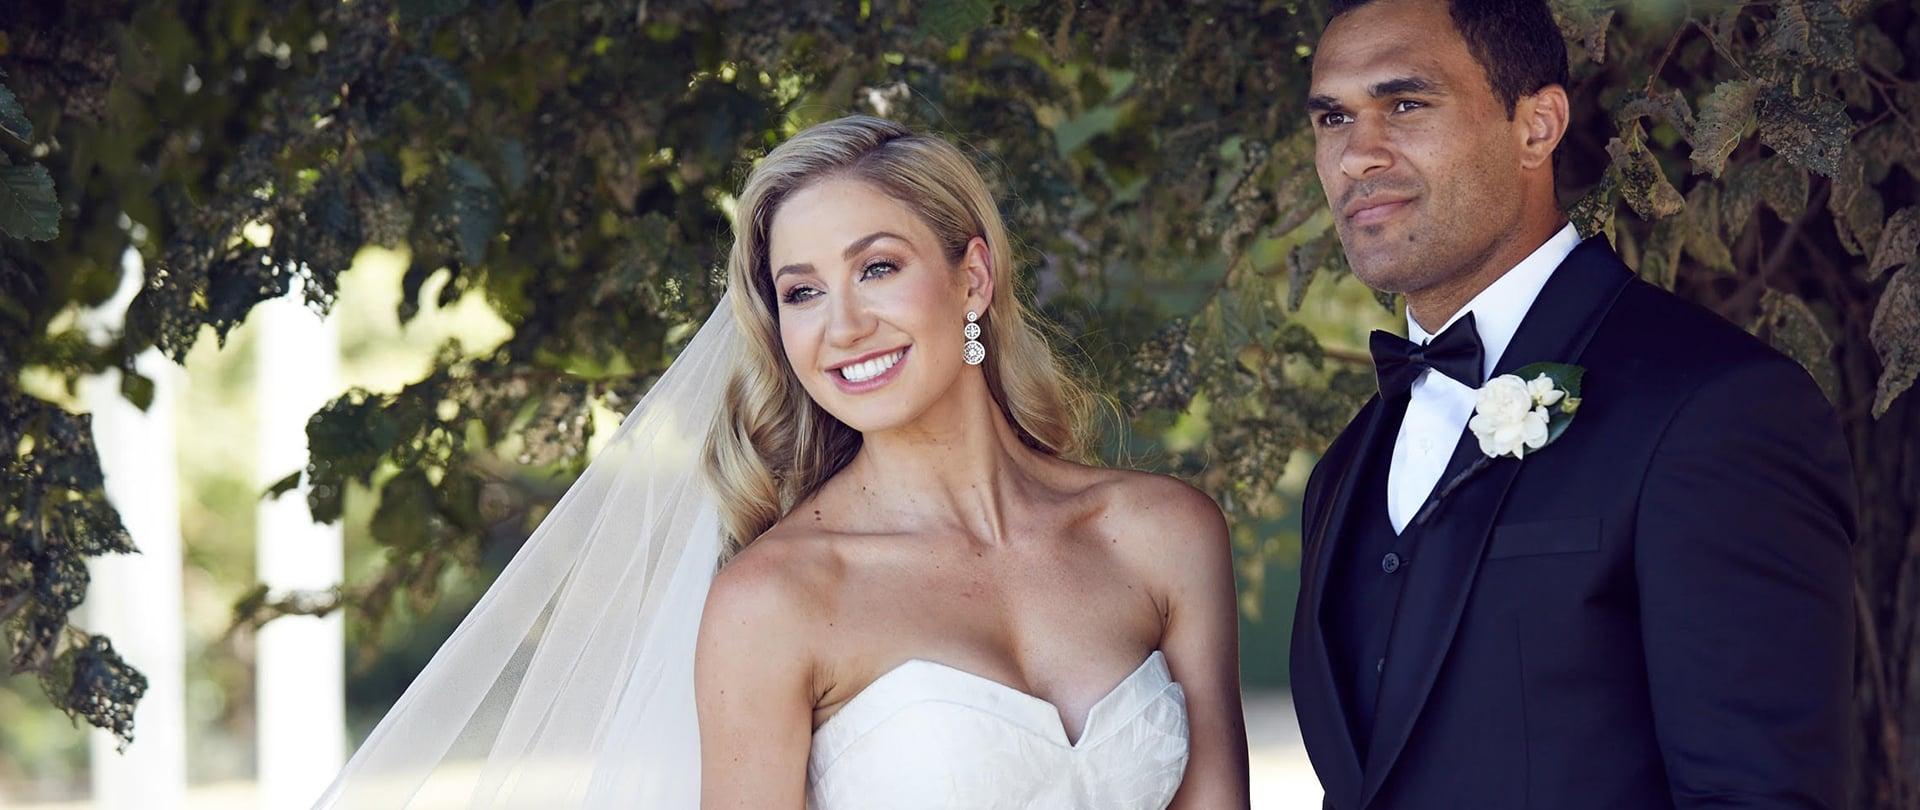 Chantelle & Justin Wedding Video Filmed at Yarra Valley, Victoria